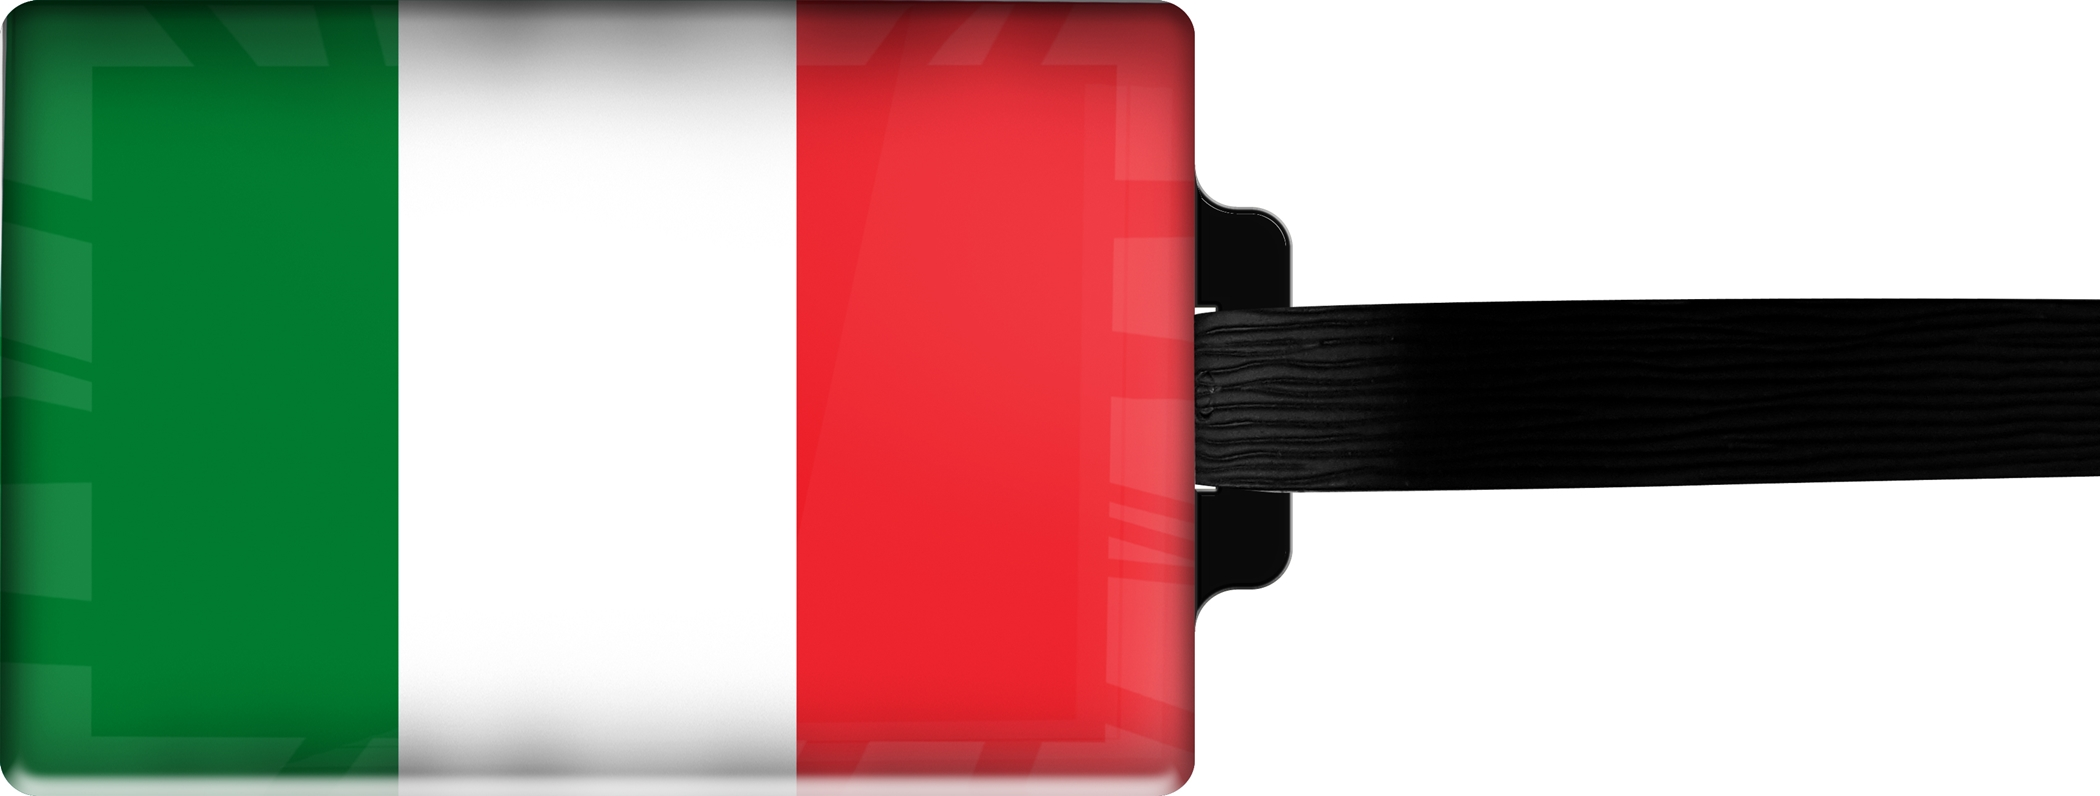 Hochwertiger Gepäckanhänger aus Acrylglas | FLAGGE ITALIEN | metALUm #00072